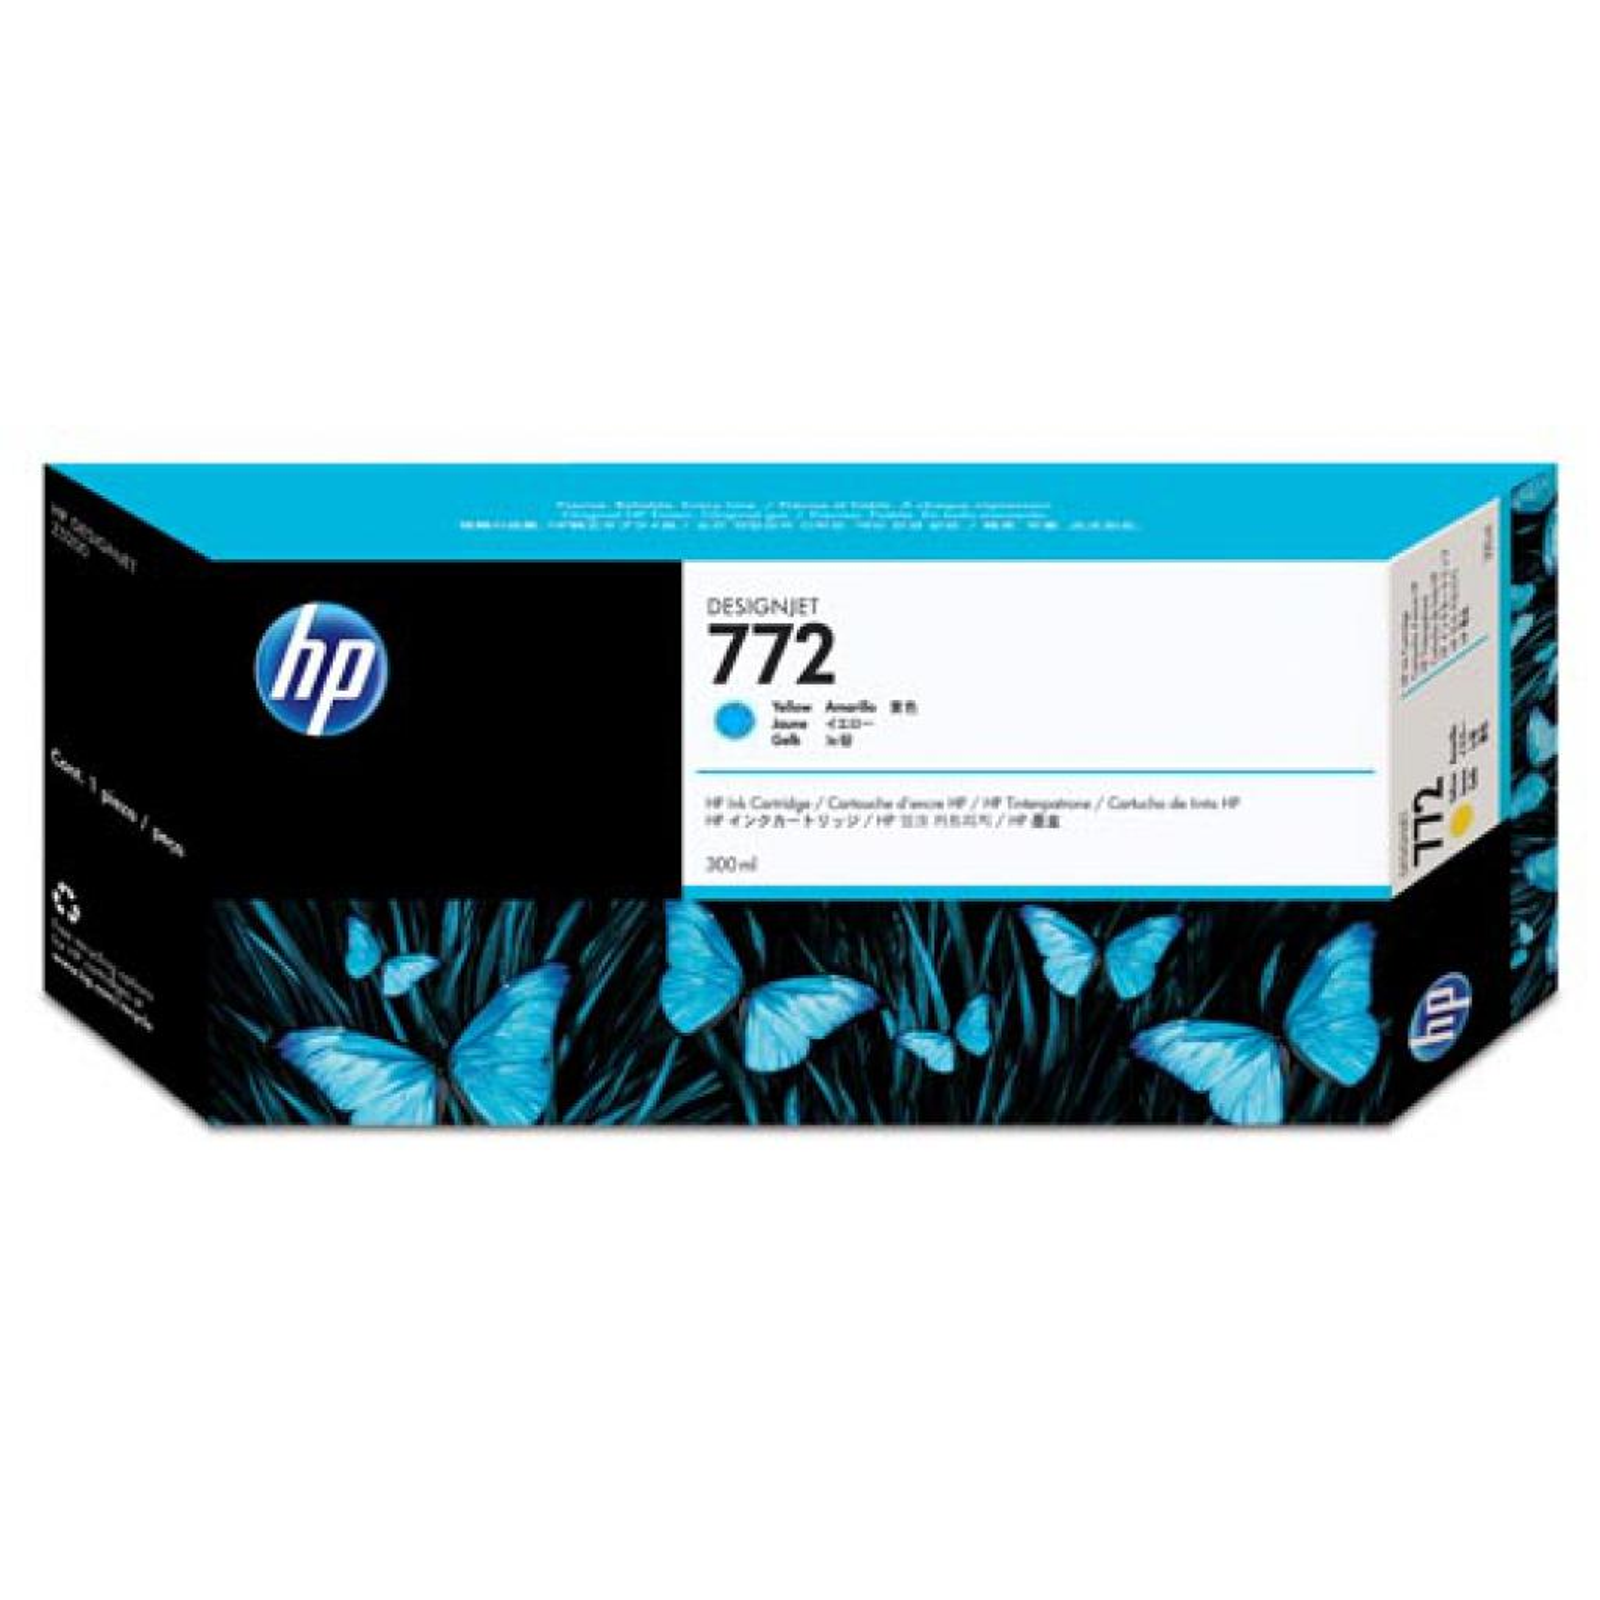 Картридж HP DJ No.772 Light Cyan Designjet Z5200 300 ml (CN632A)